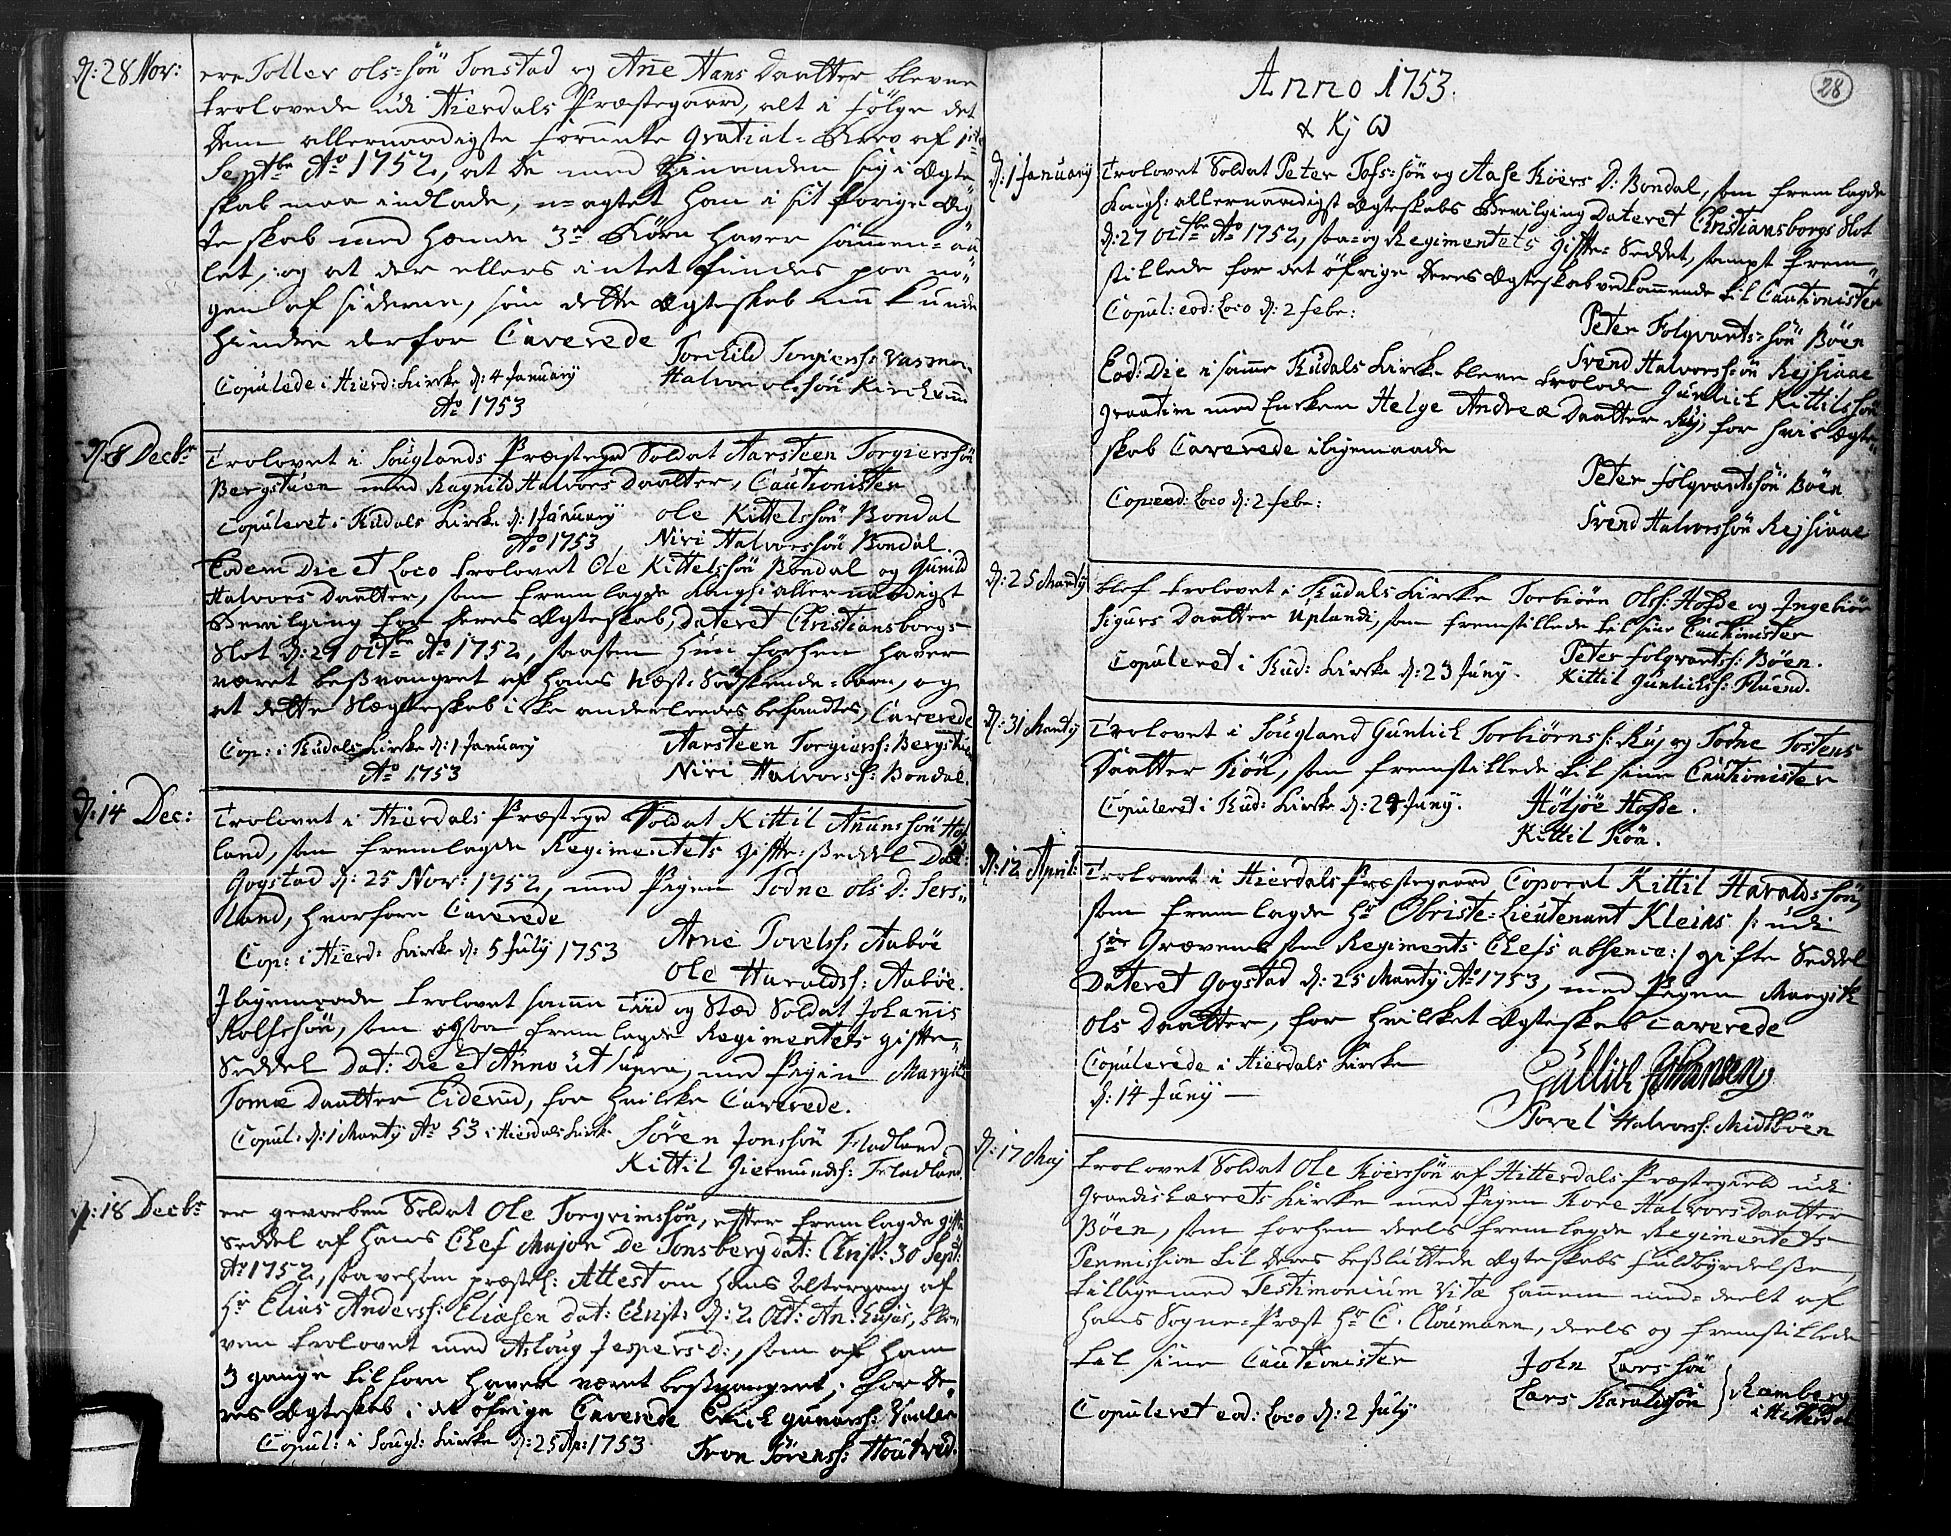 SAKO, Hjartdal kirkebøker, F/Fa/L0004: Ministerialbok nr. I 4, 1727-1795, s. 28